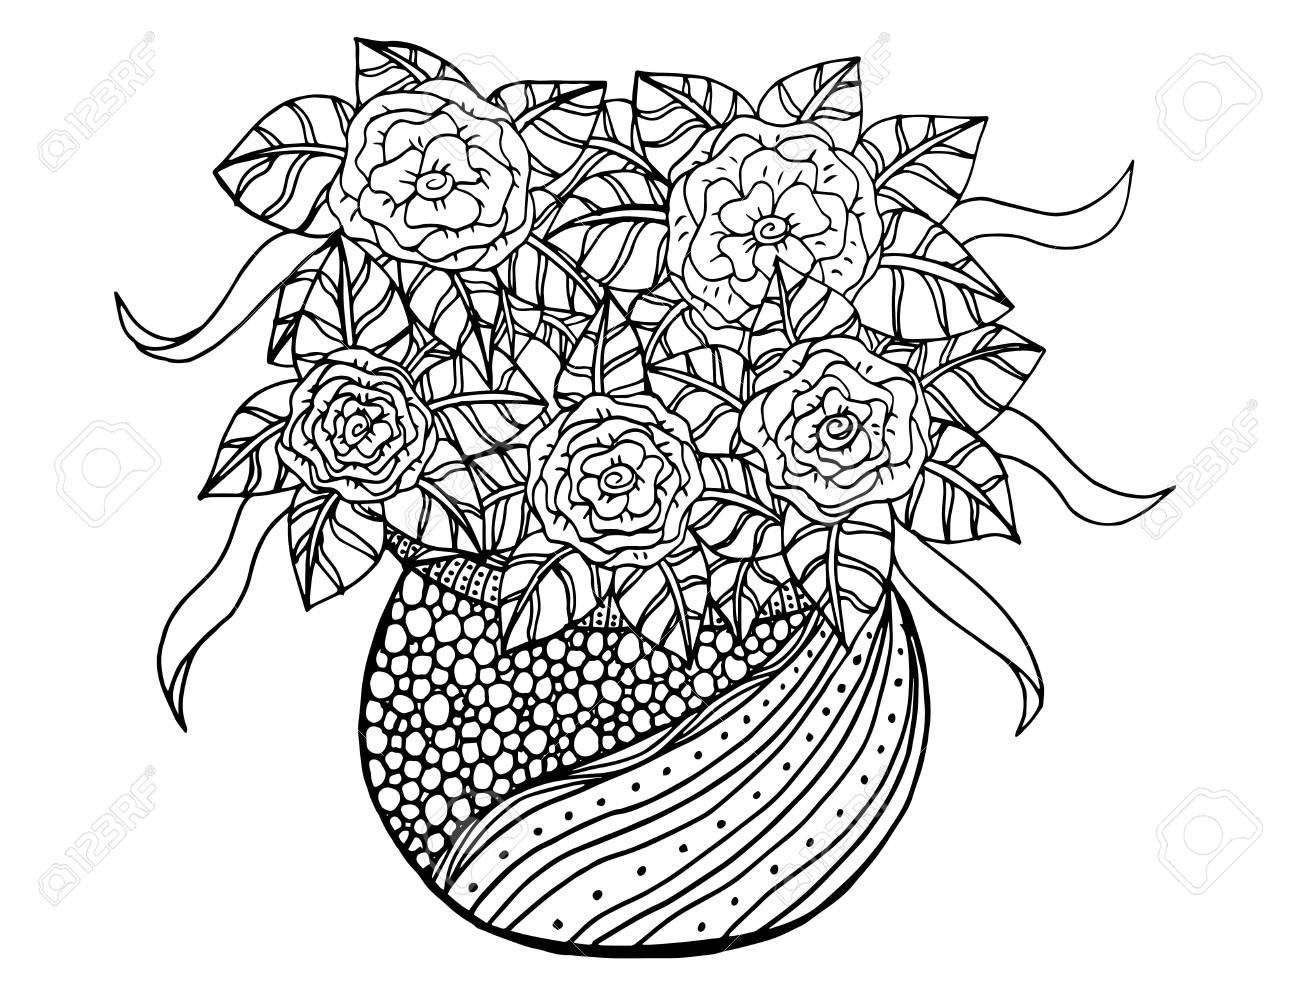 Doodle floral illustrated bouquet of flowers in a vase hand bouquet of flowers in a vase hand drawing stock vector izmirmasajfo